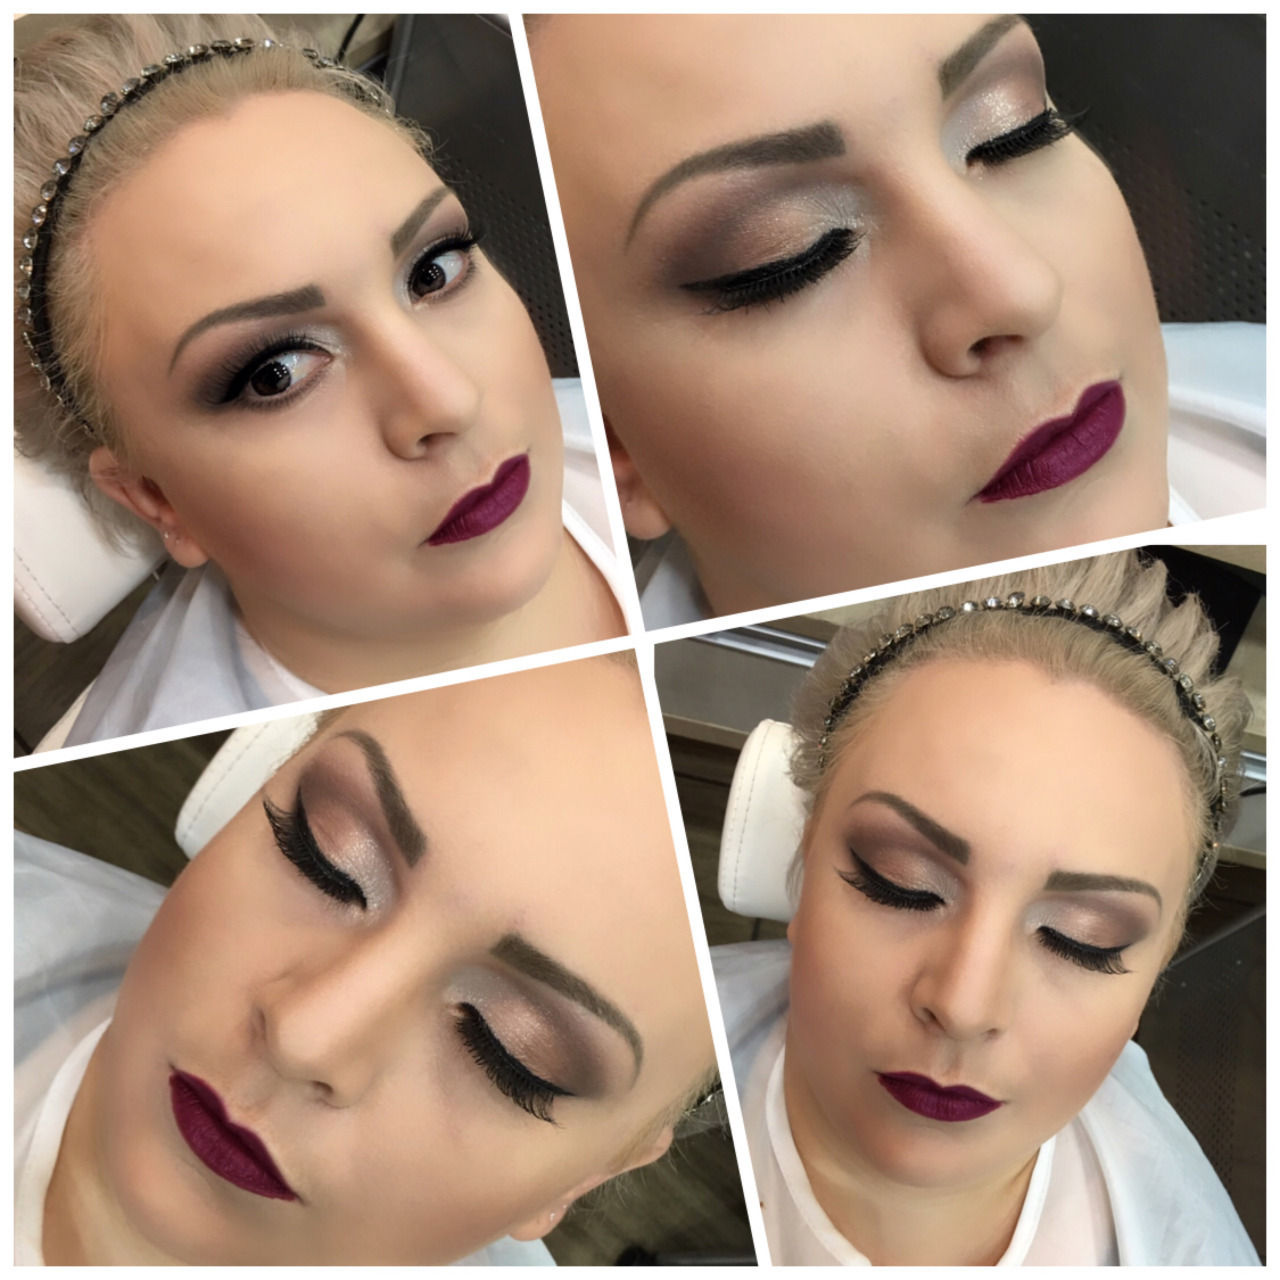 maquiagem maquiador(a) manicure e pedicure esteticista micropigmentador(a)